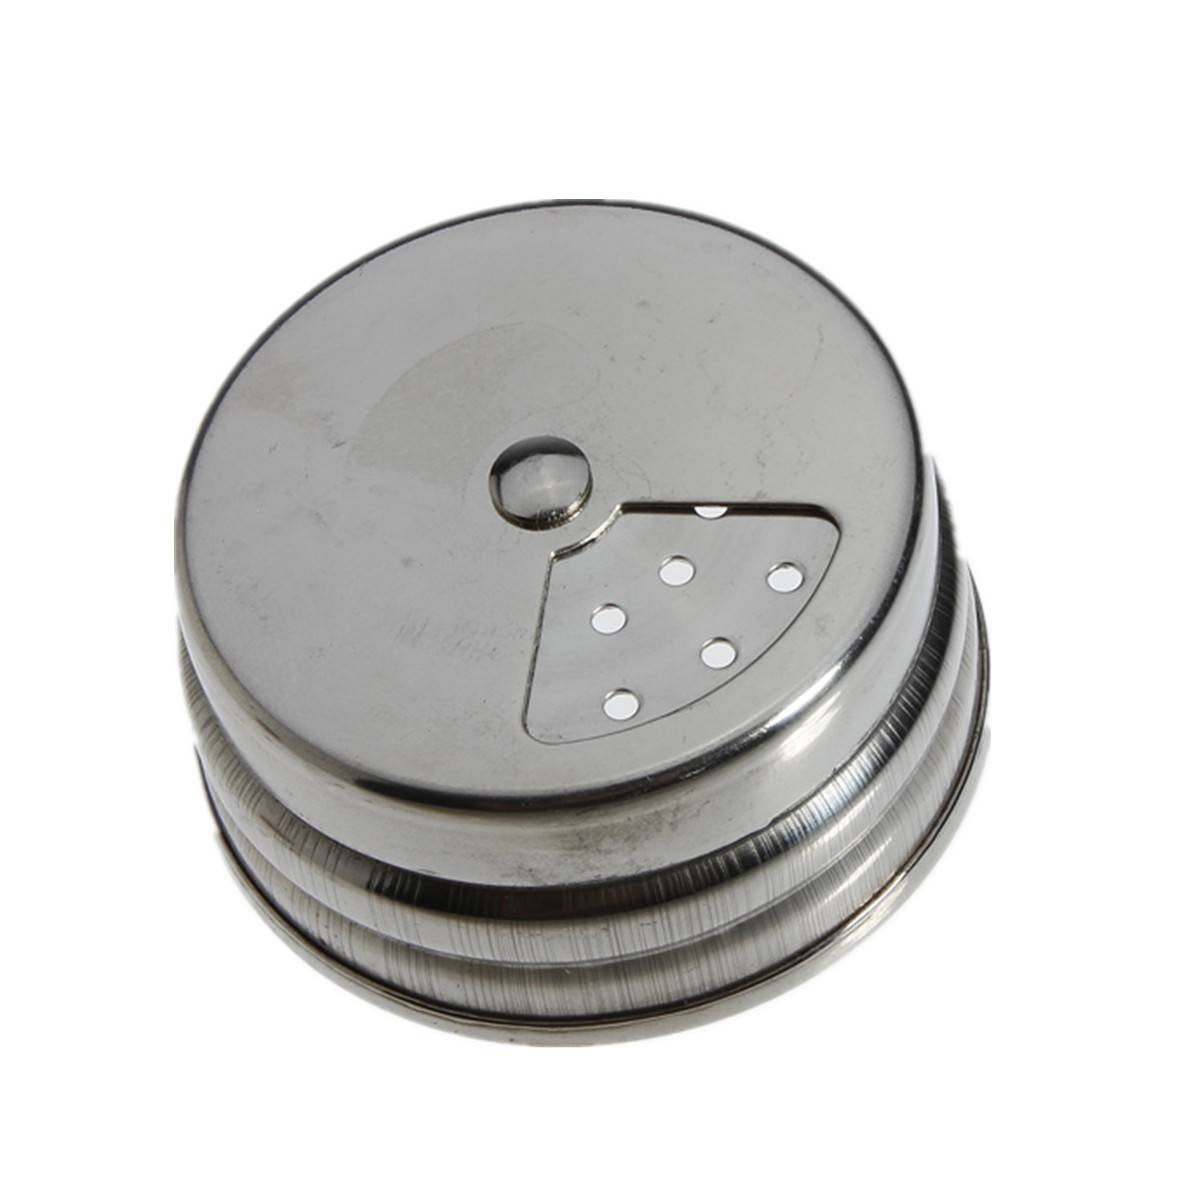 Stainless steel spice sugar salt pepper herb shaker jar toothpick storage bottle ebay - Toothpick shaker ...